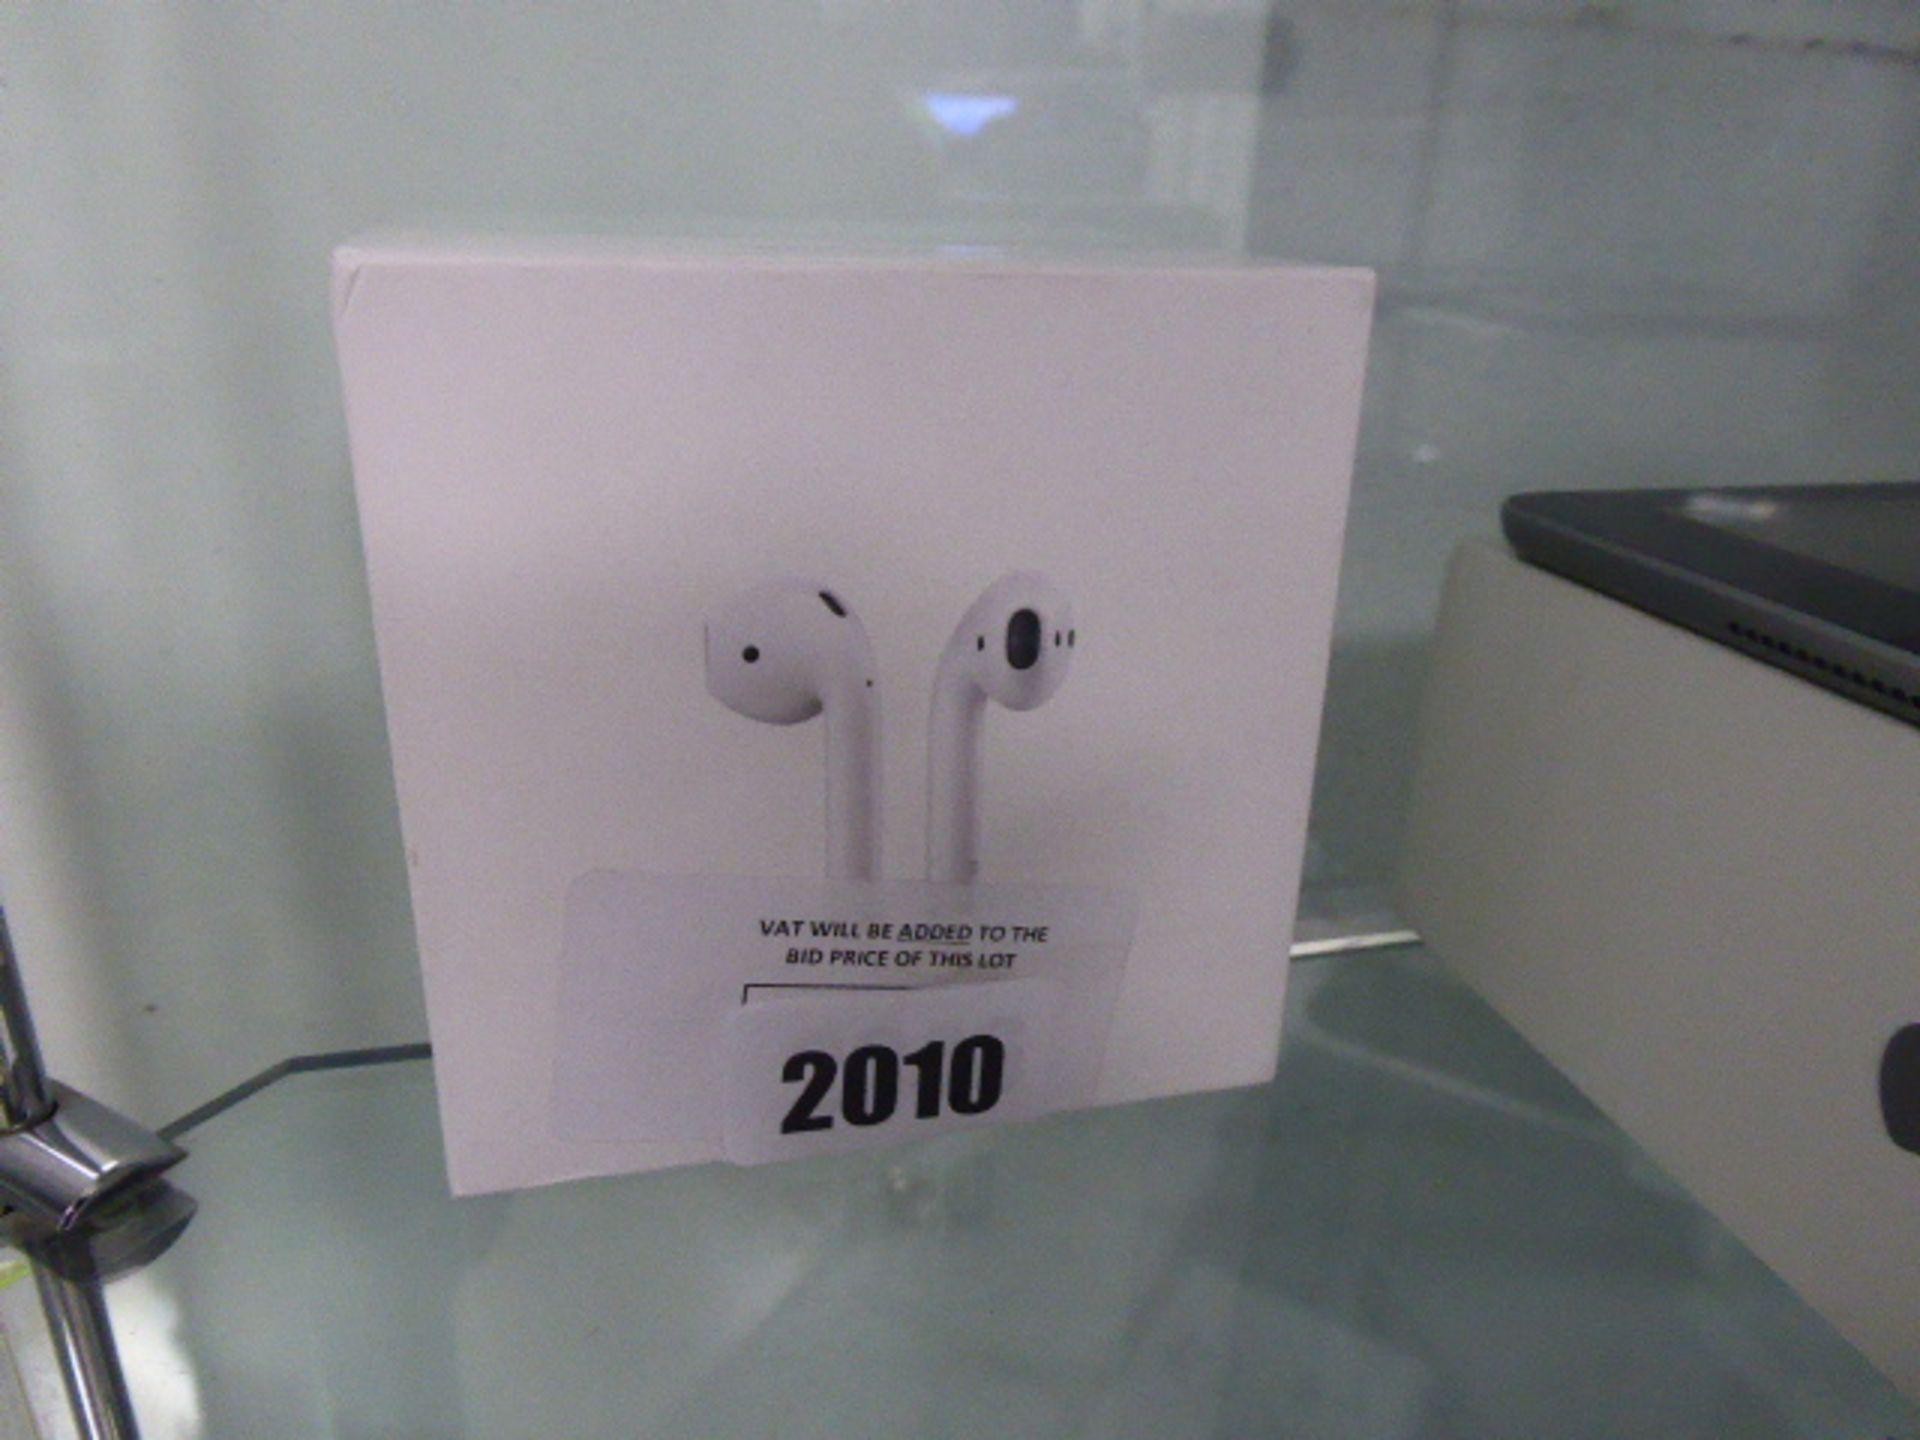 Lot 2010 - 2346 Apple Air Pod 1st Generation in box